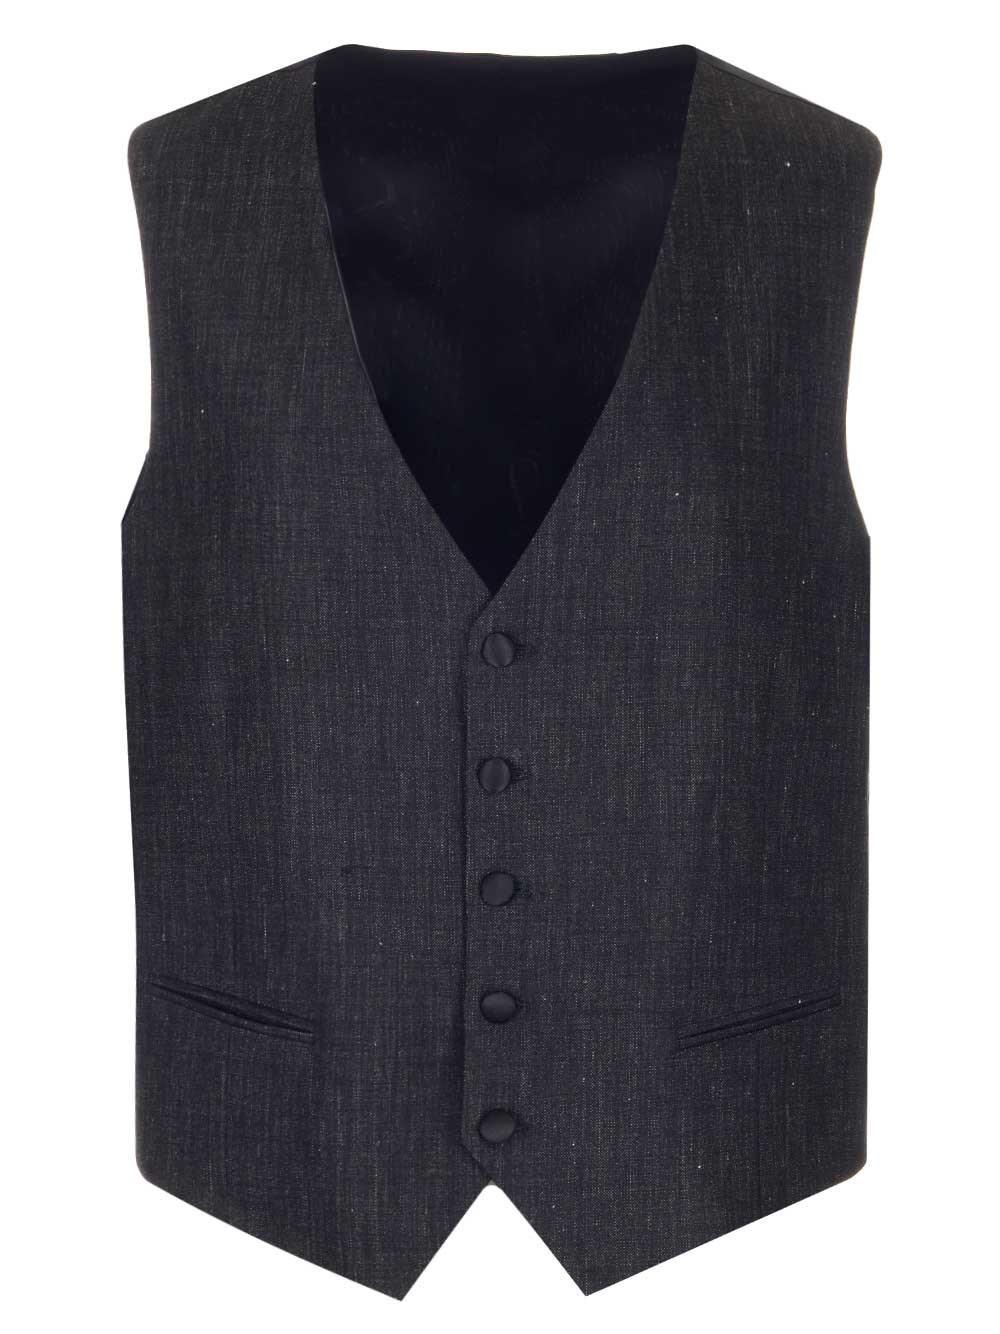 AL DUCA D'AOSTA 1902 Classic Waistcoat